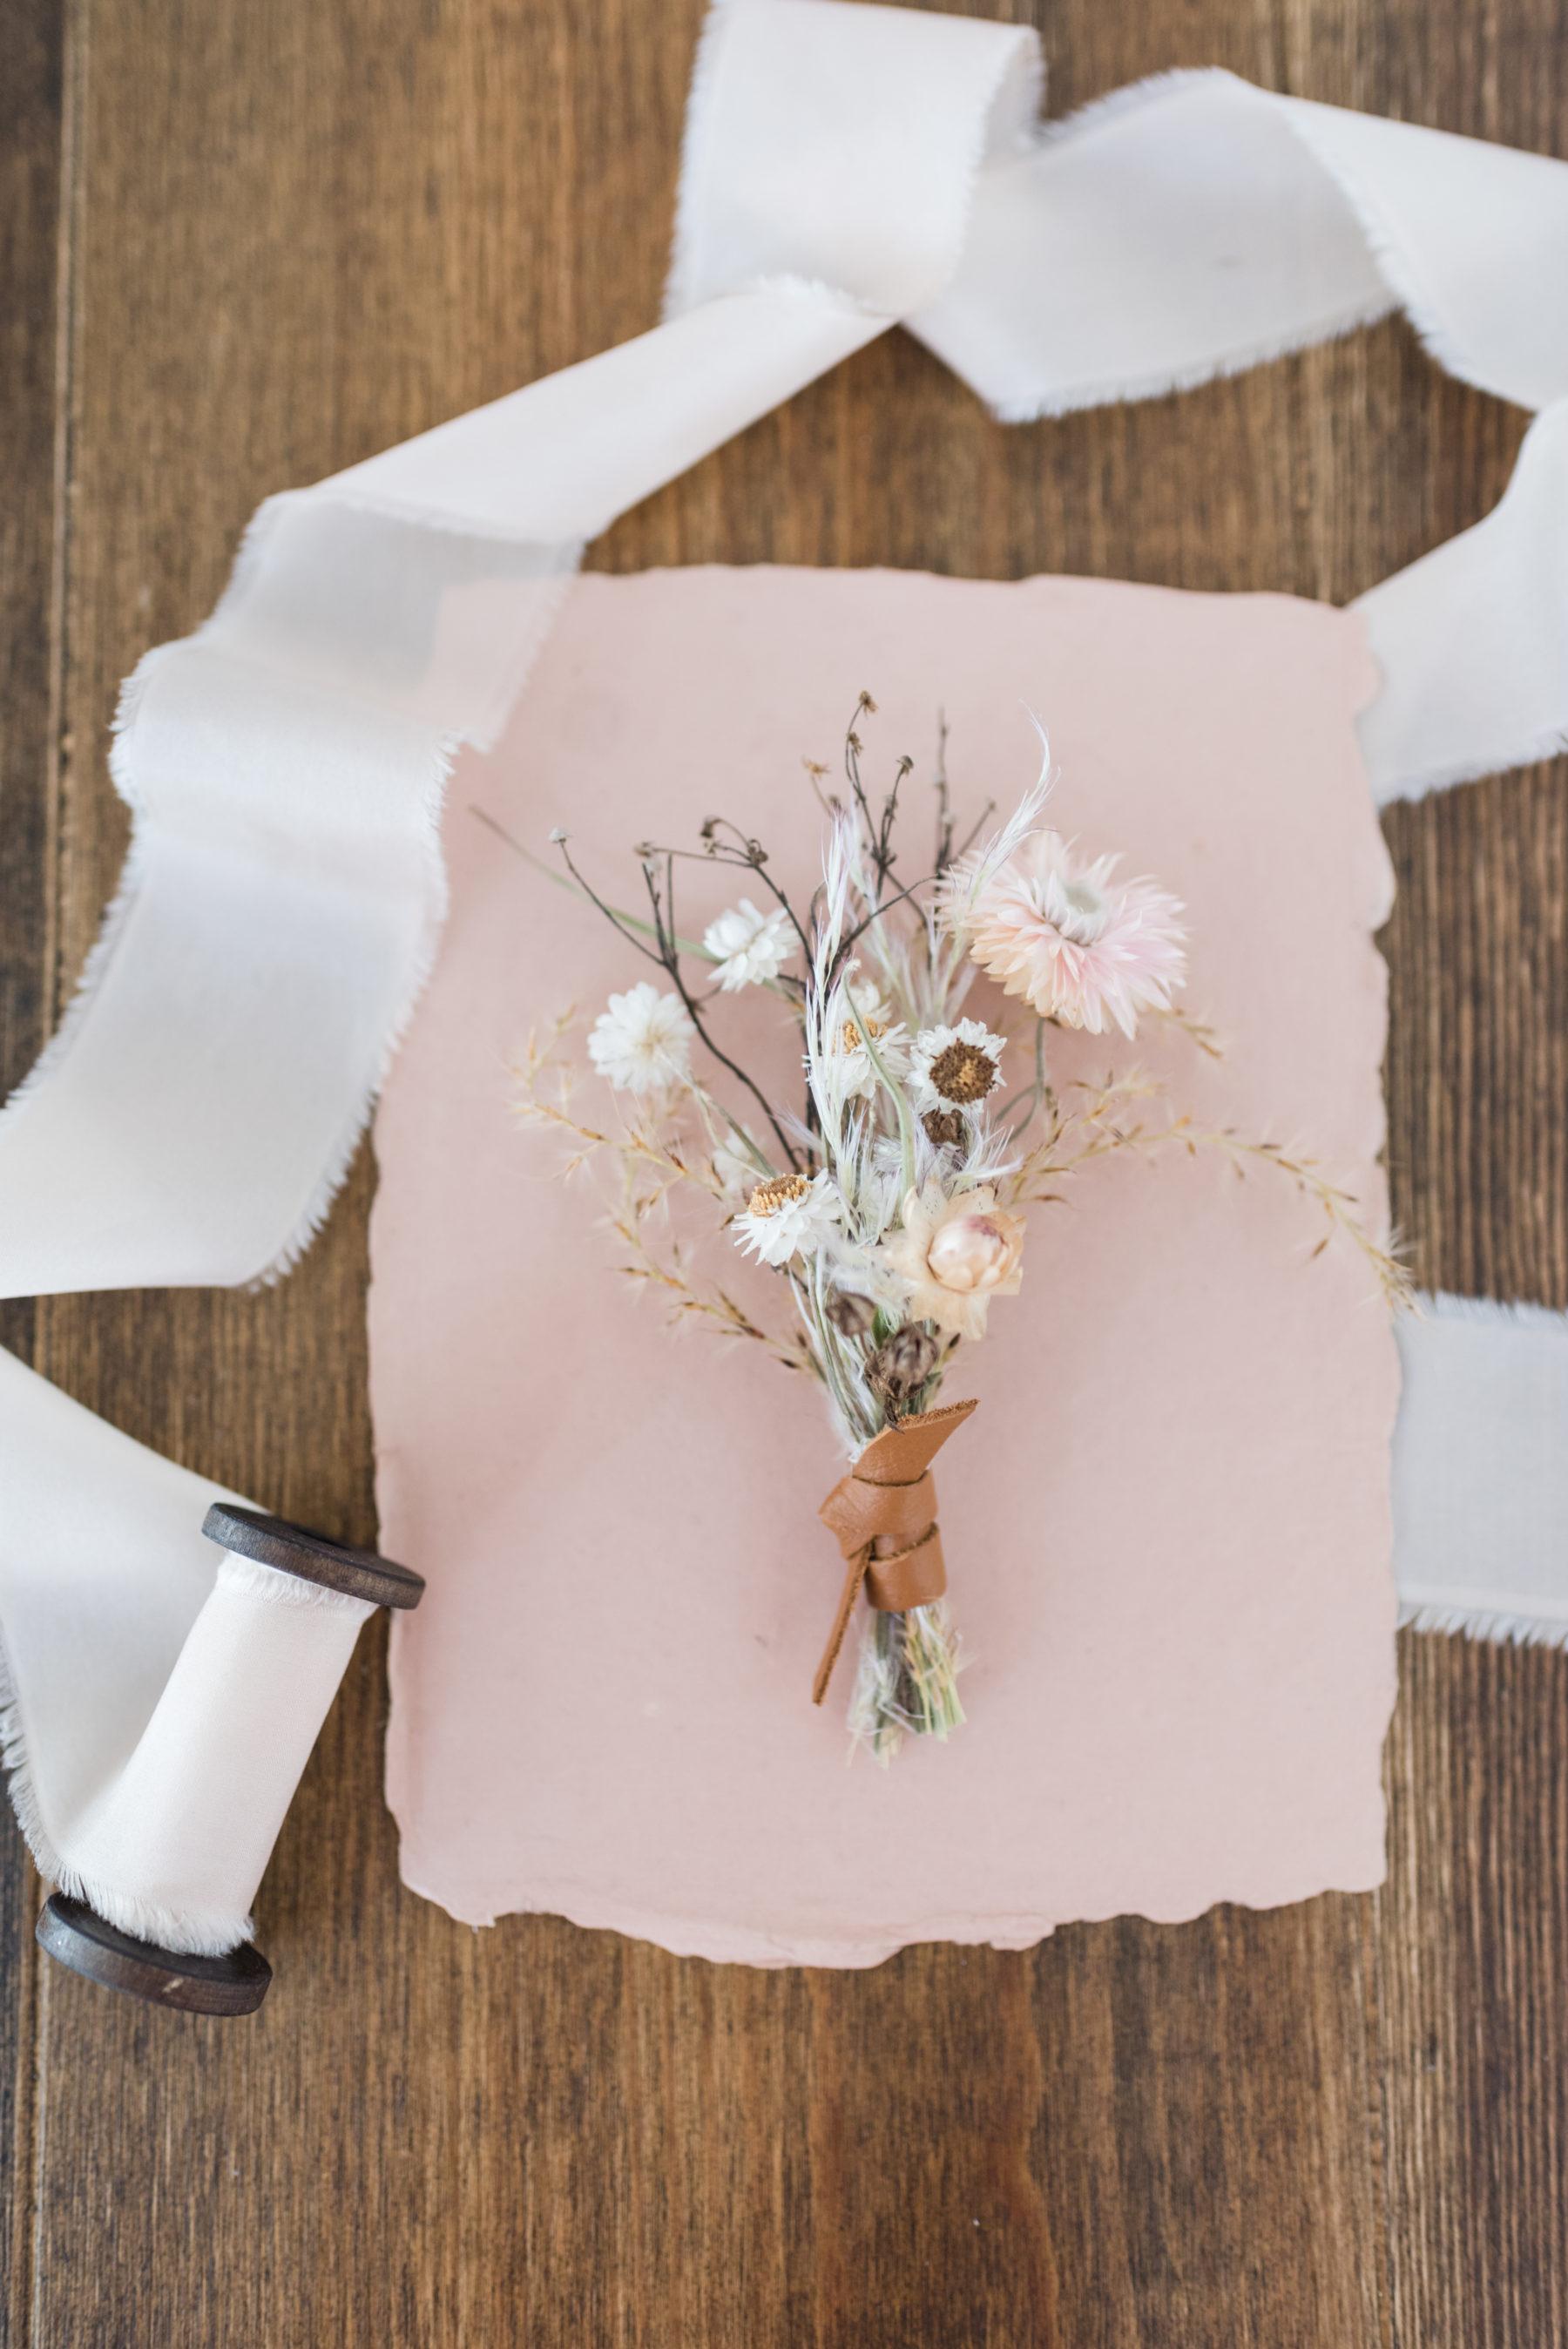 Organic Wedding Bouquet: Organic Eco-Friendly Wedding Styled Shoot featured on Nashville Bride Guide